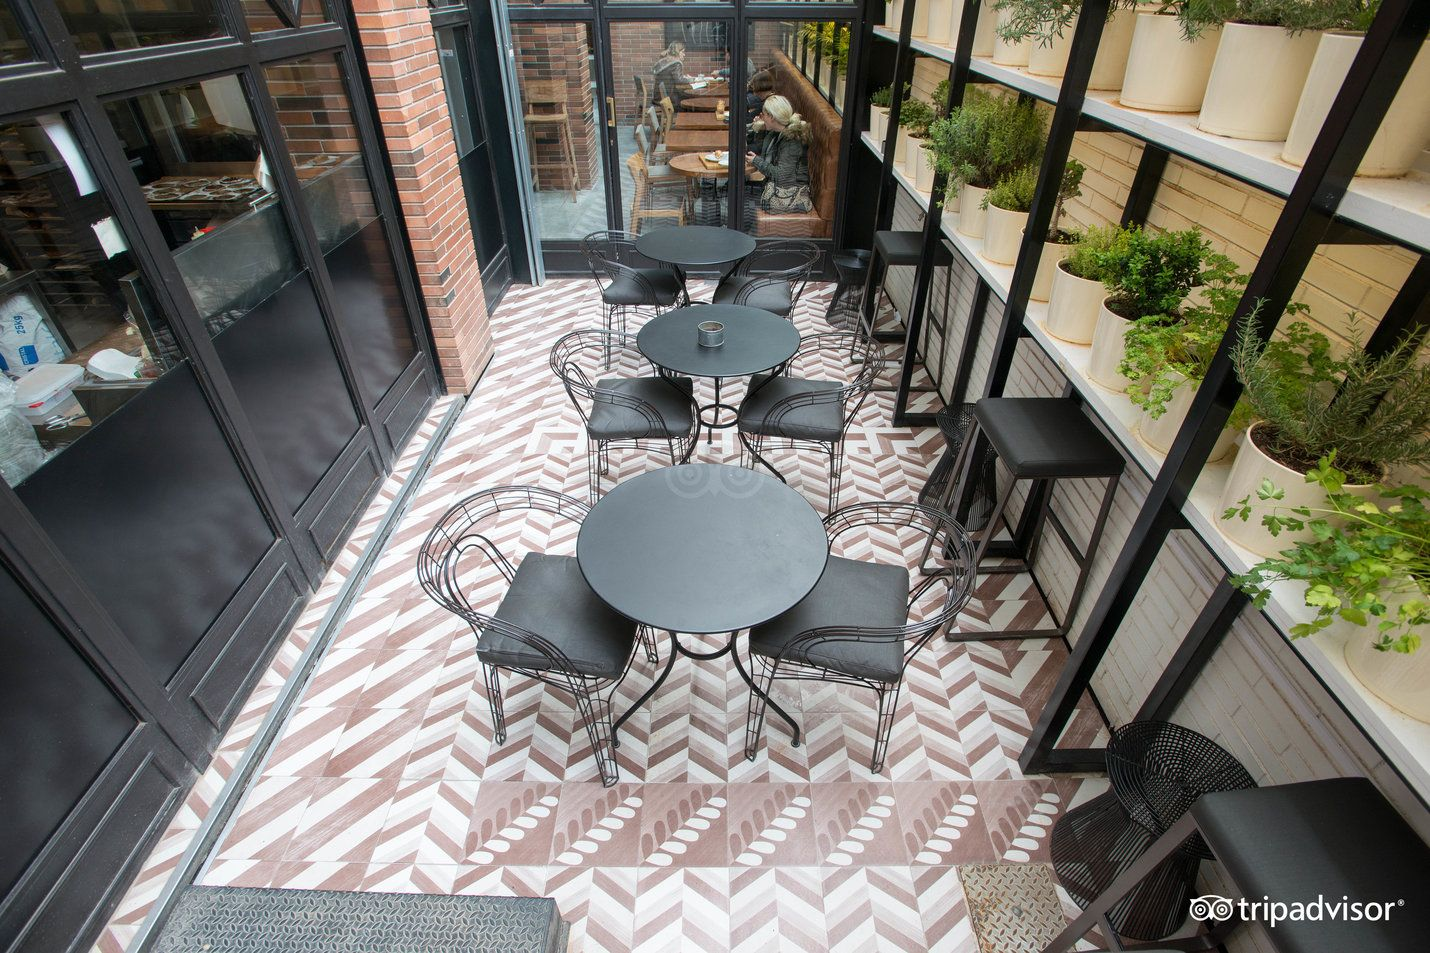 hotel praktik bakery barcelona ve 344 opiniones y 177 fotos praktik bakery barcelona. Black Bedroom Furniture Sets. Home Design Ideas